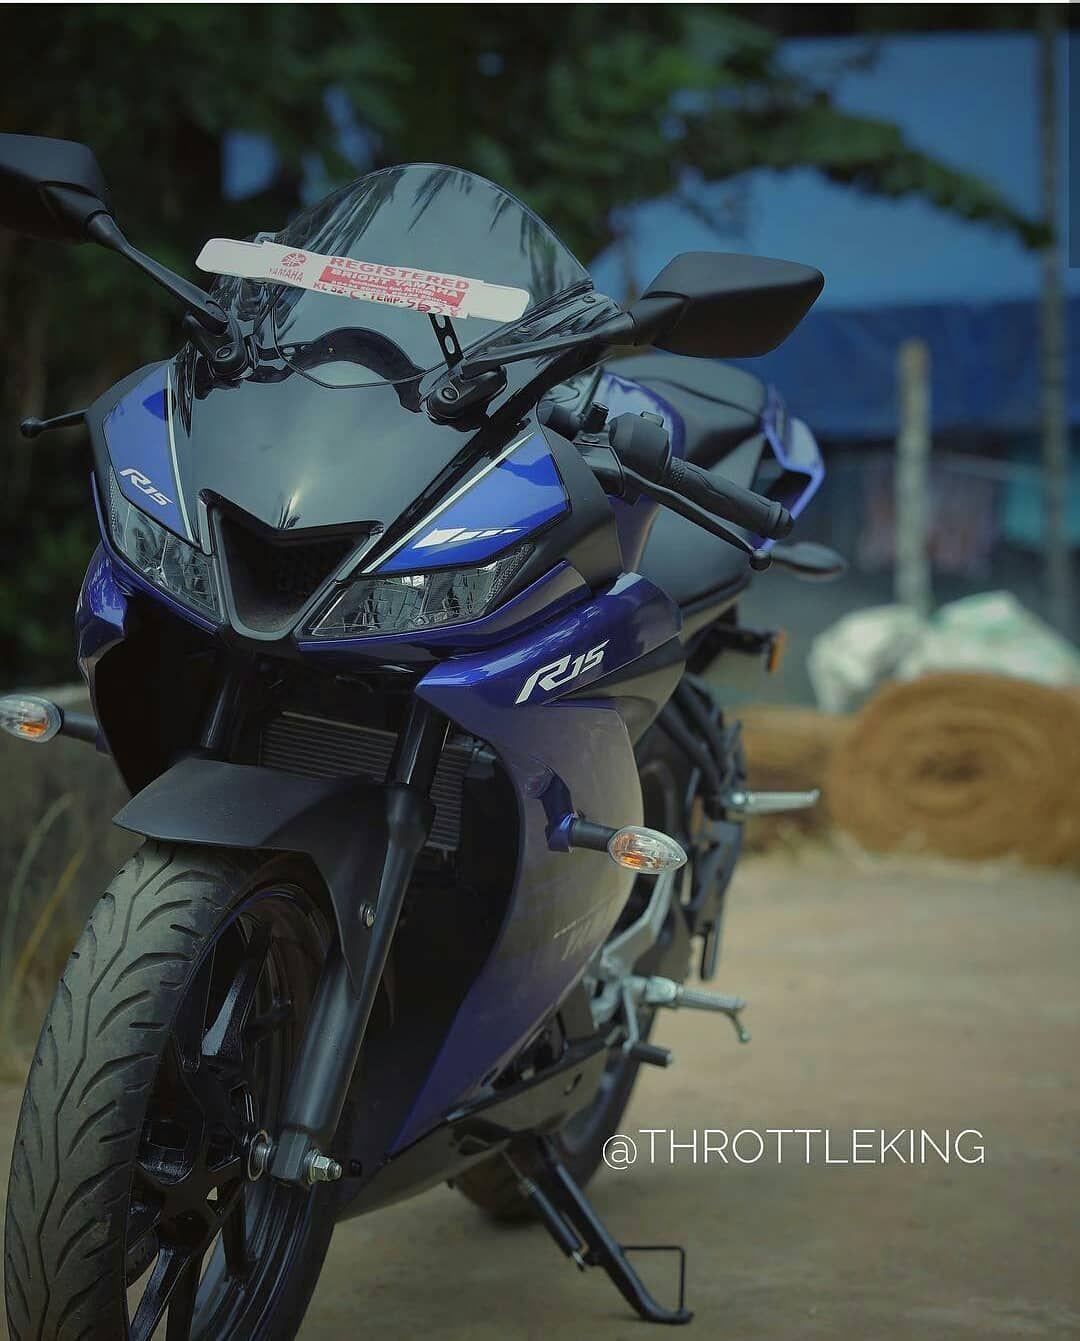 Follow R15 V3 0 Follow Admin Nithi Trendy Dm Your Bike Pic